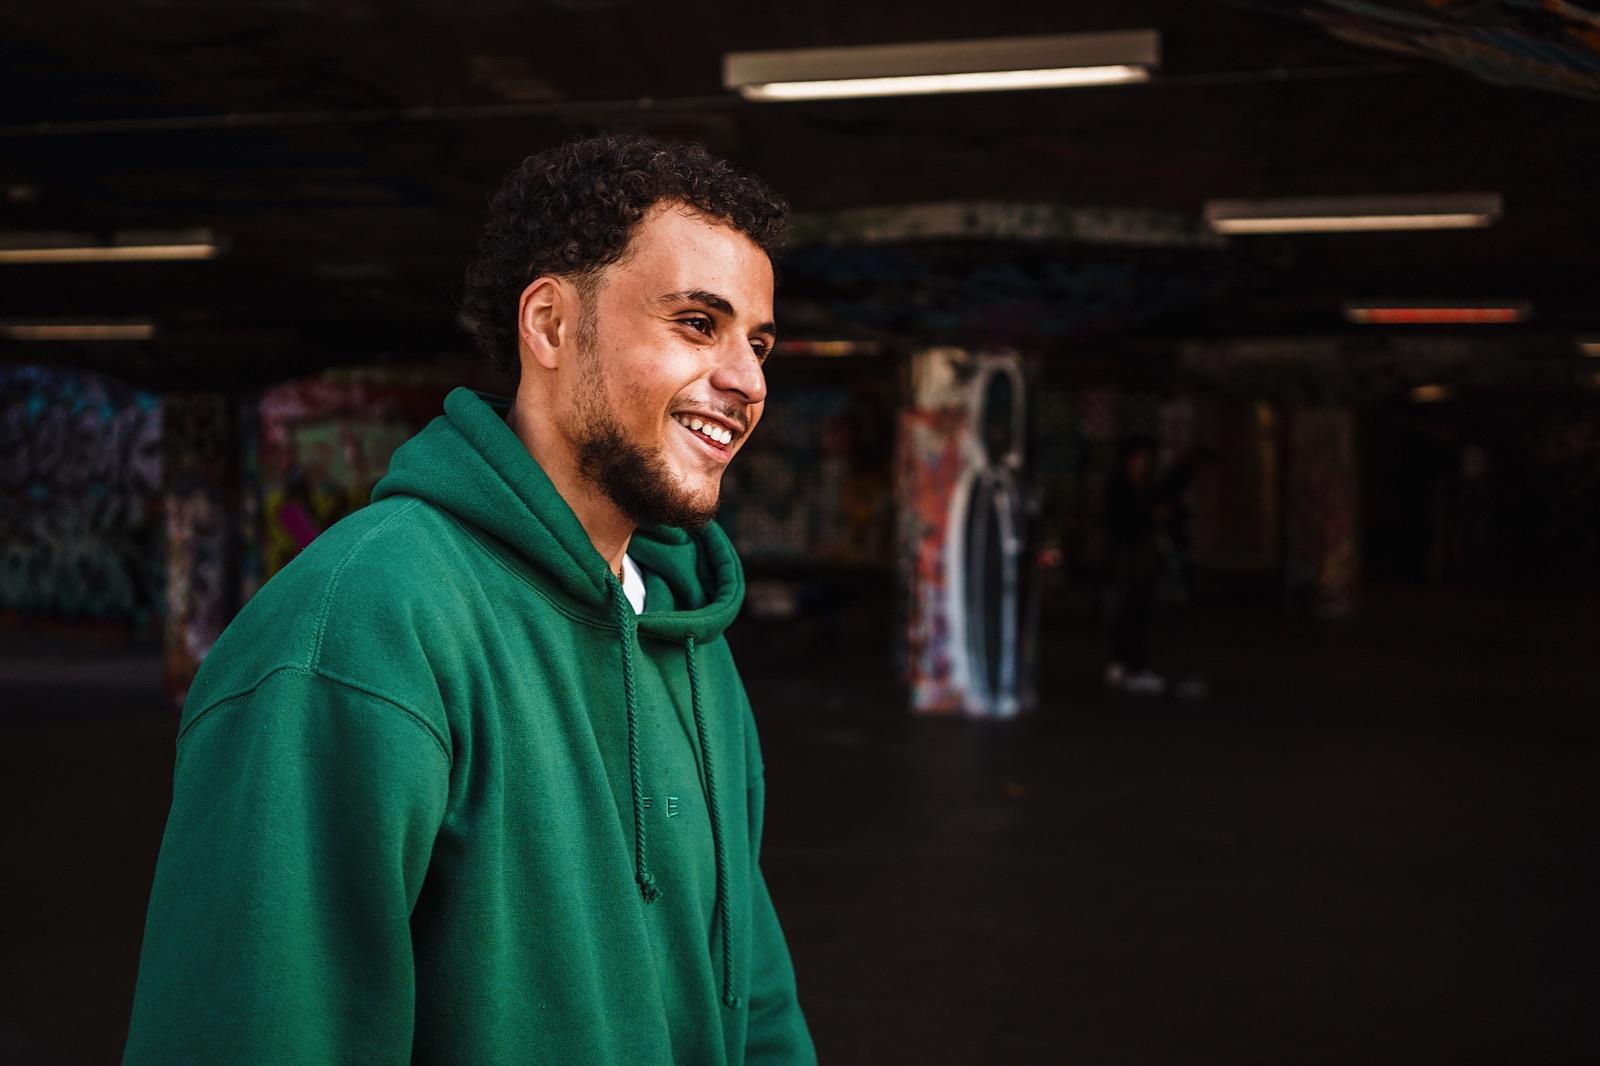 Man in green hoodie at skate park grinning